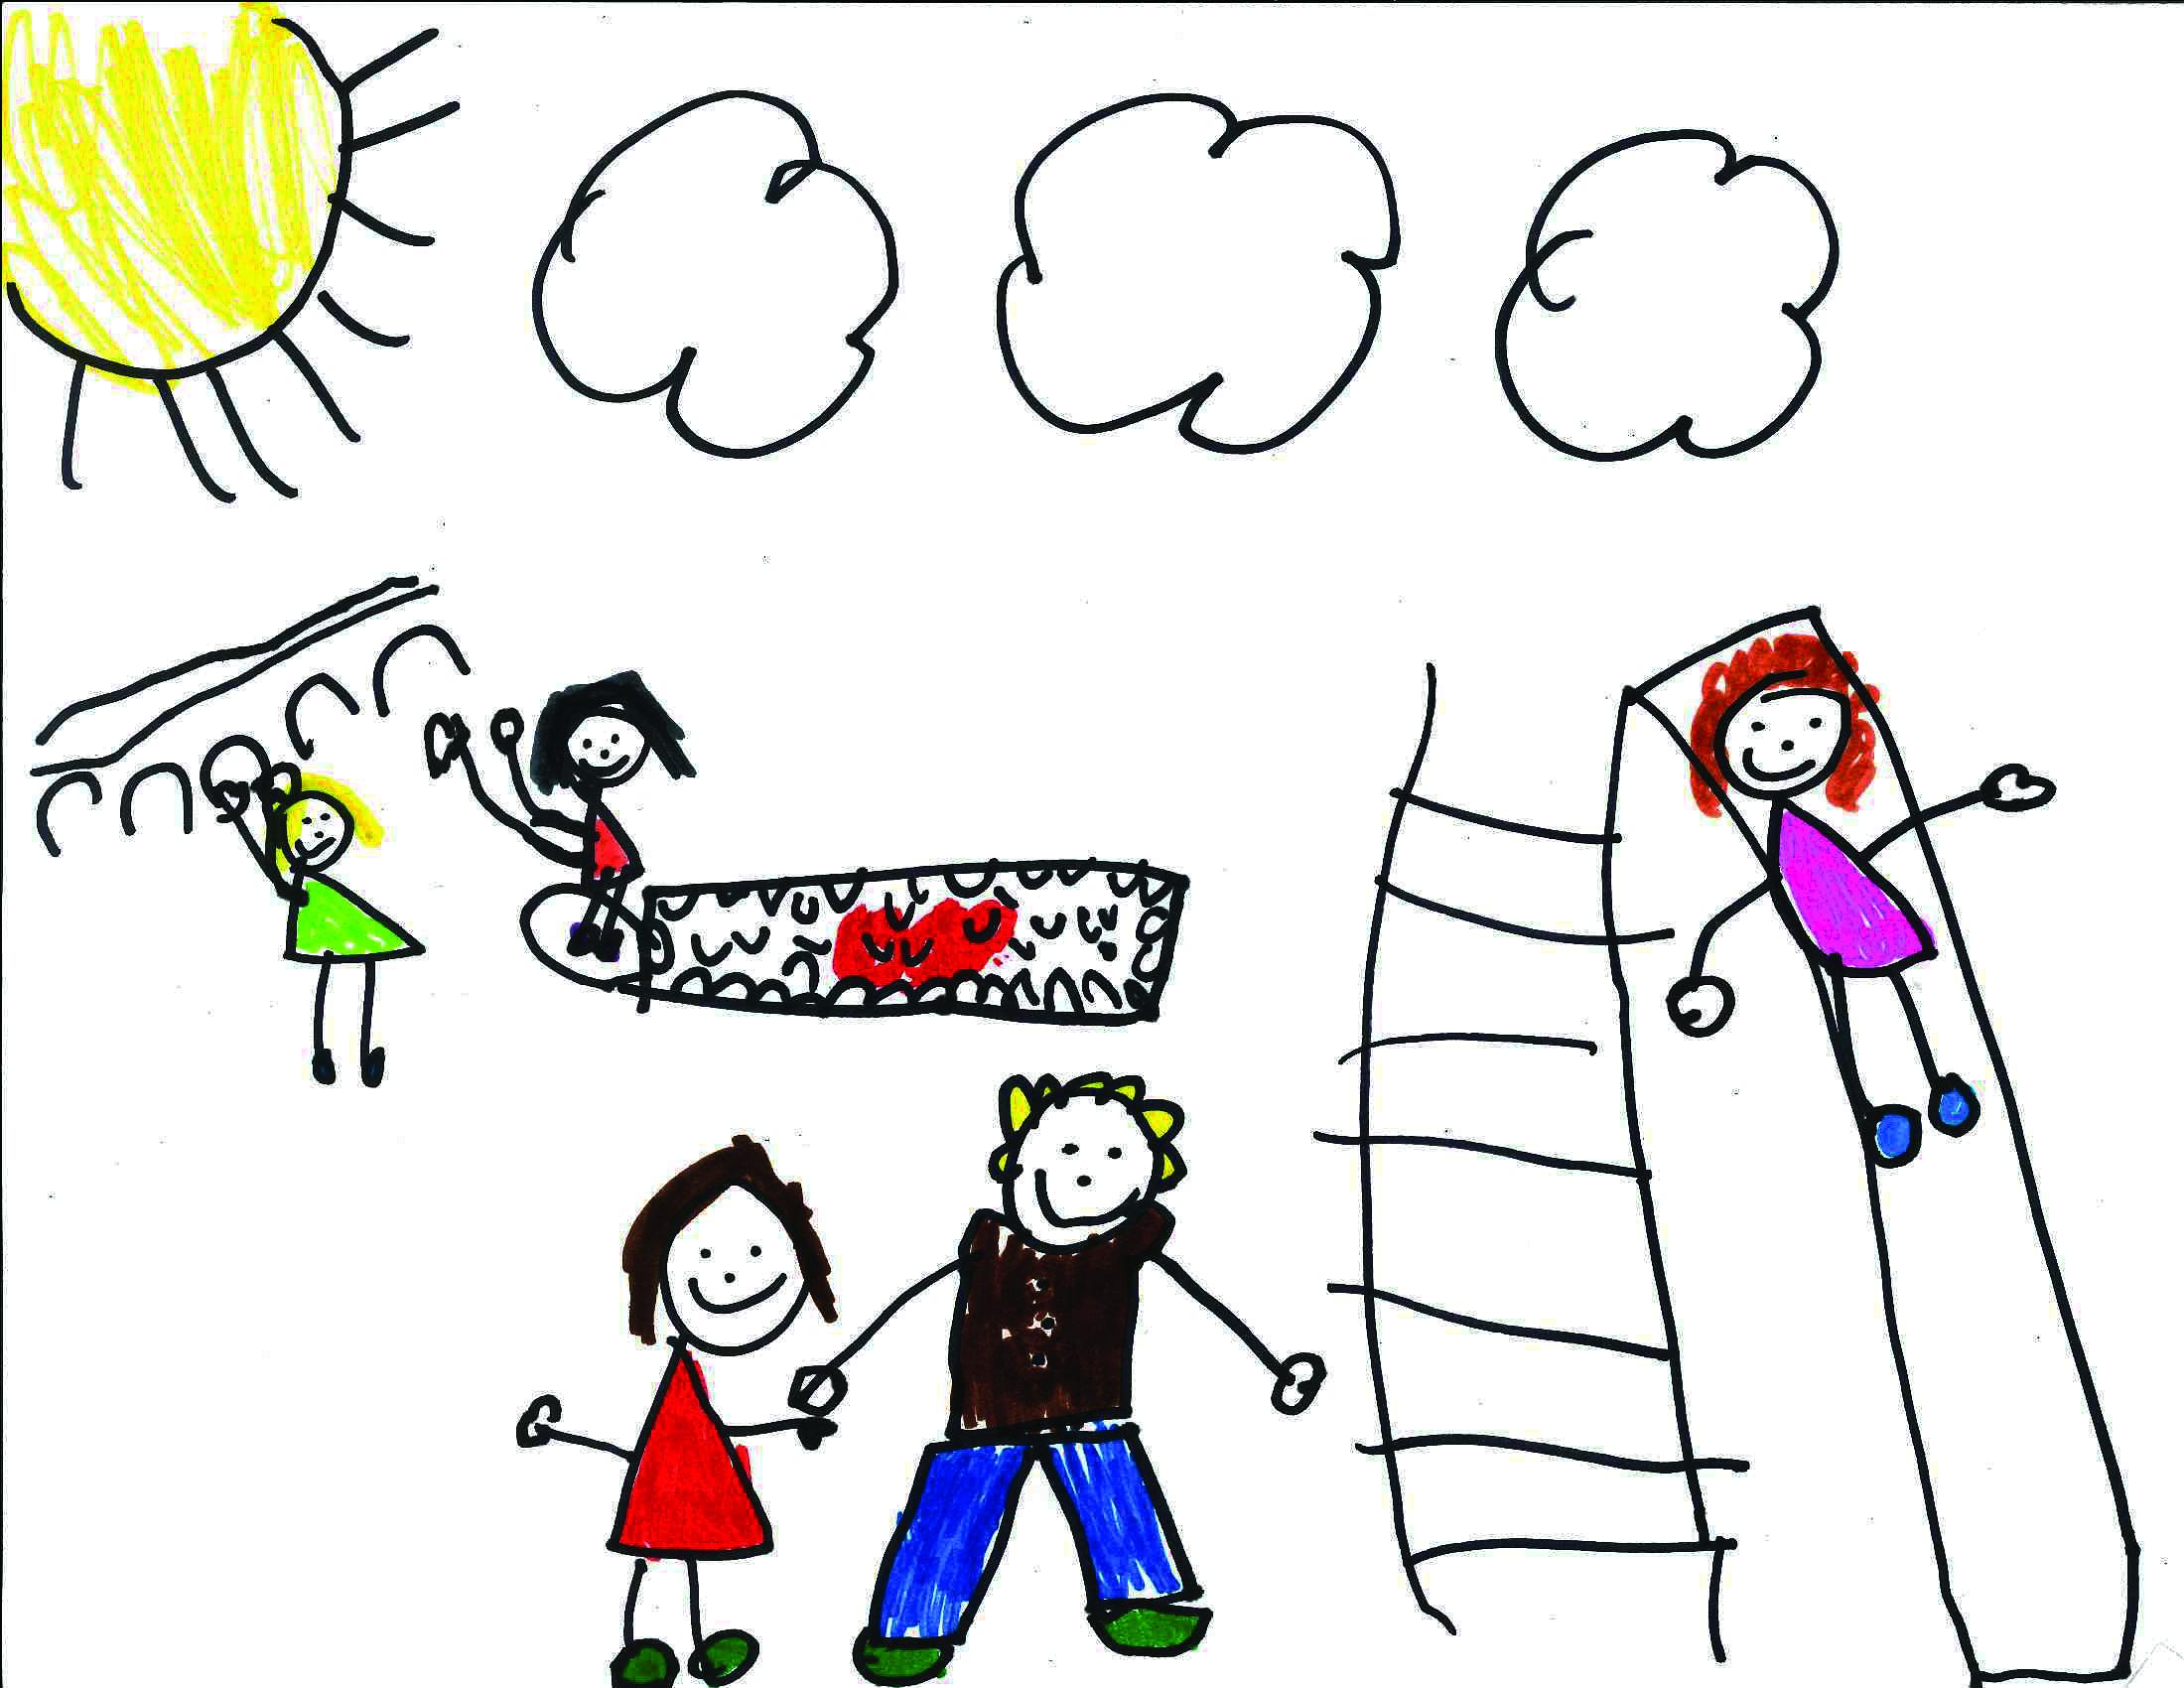 2200x1700 Sitka Community Playground To Host Design Day On April 9